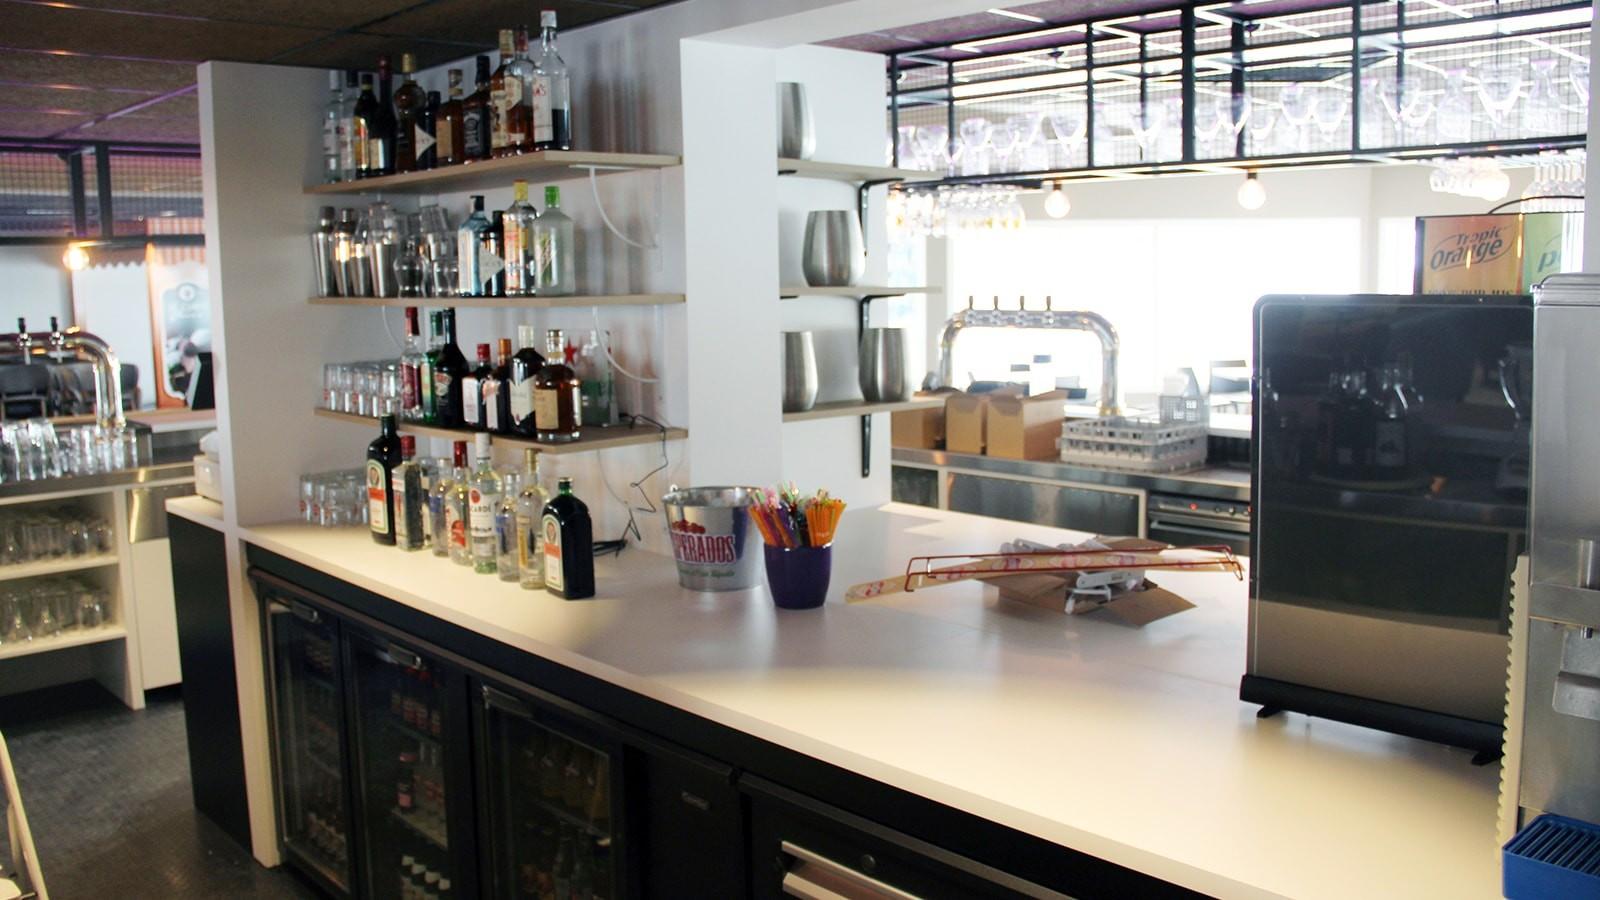 EFI Design Bar Clarys Saint Jean De Monts Efi Design (6) 1215